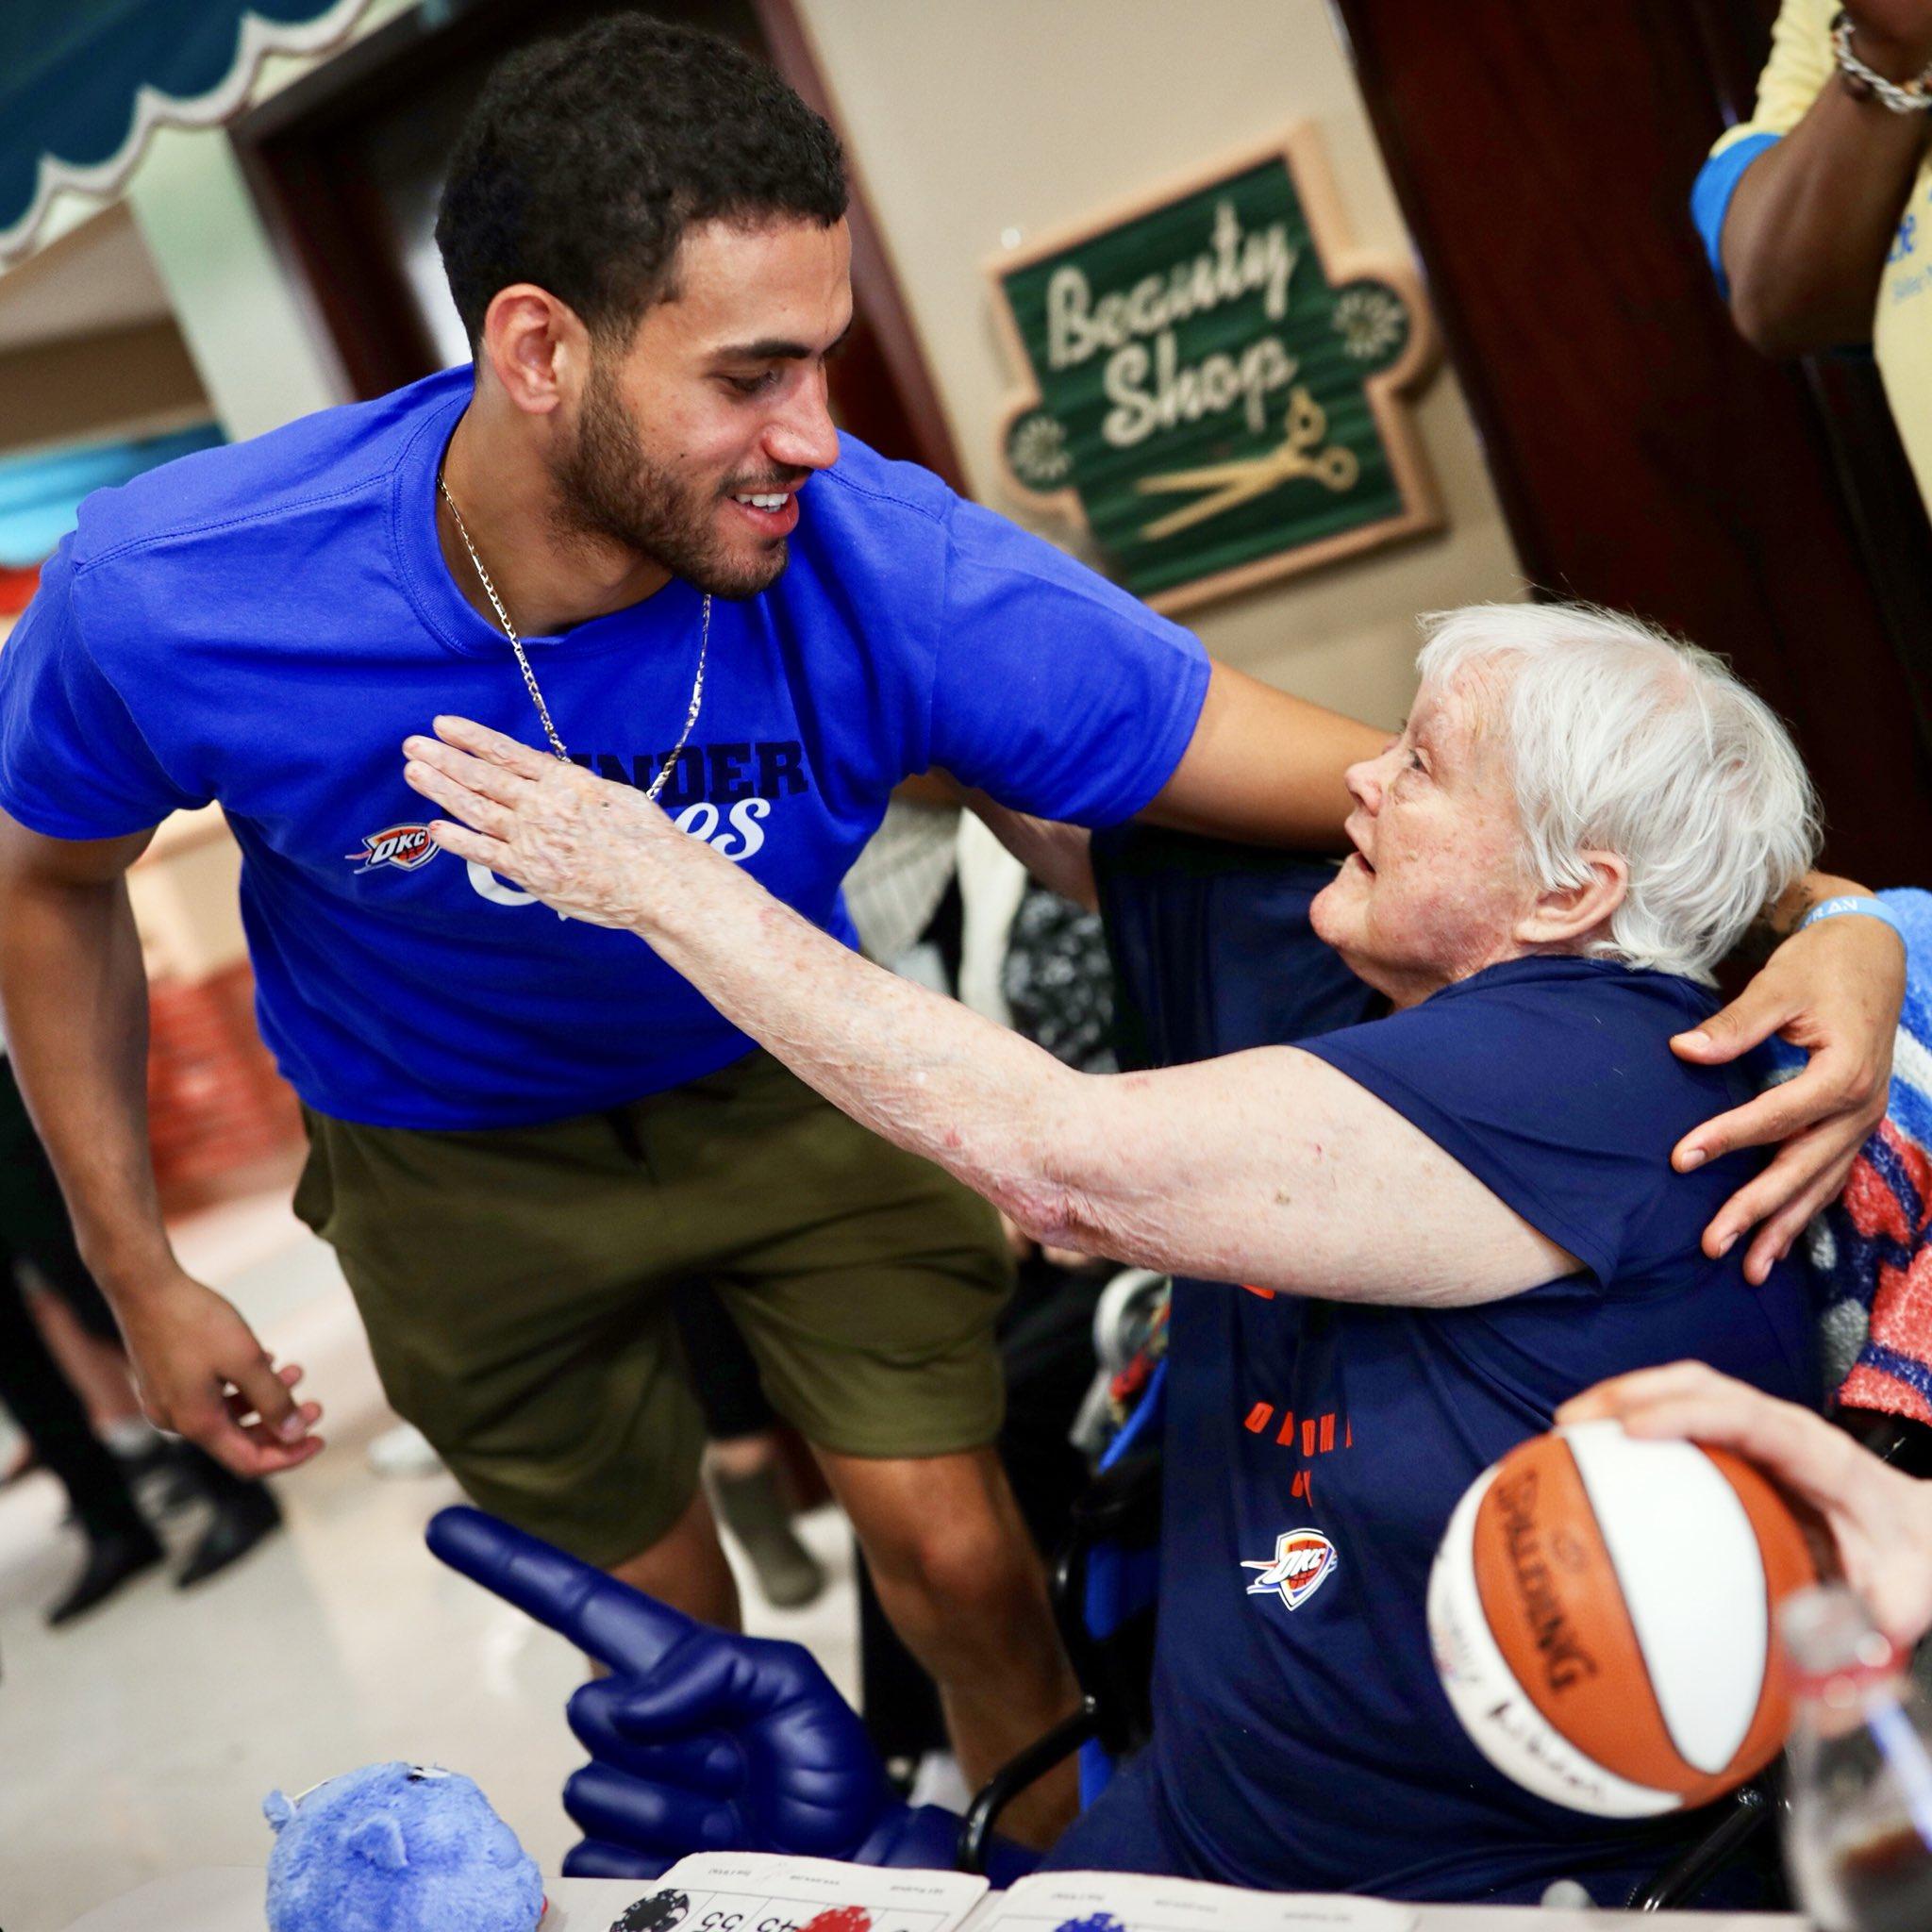 BINGO!  @AbdelNader2 and @DeonteBurton spend the afternoon spreading joy at local senior center. #ThunderCares https://t.co/oZ0zzesVe9